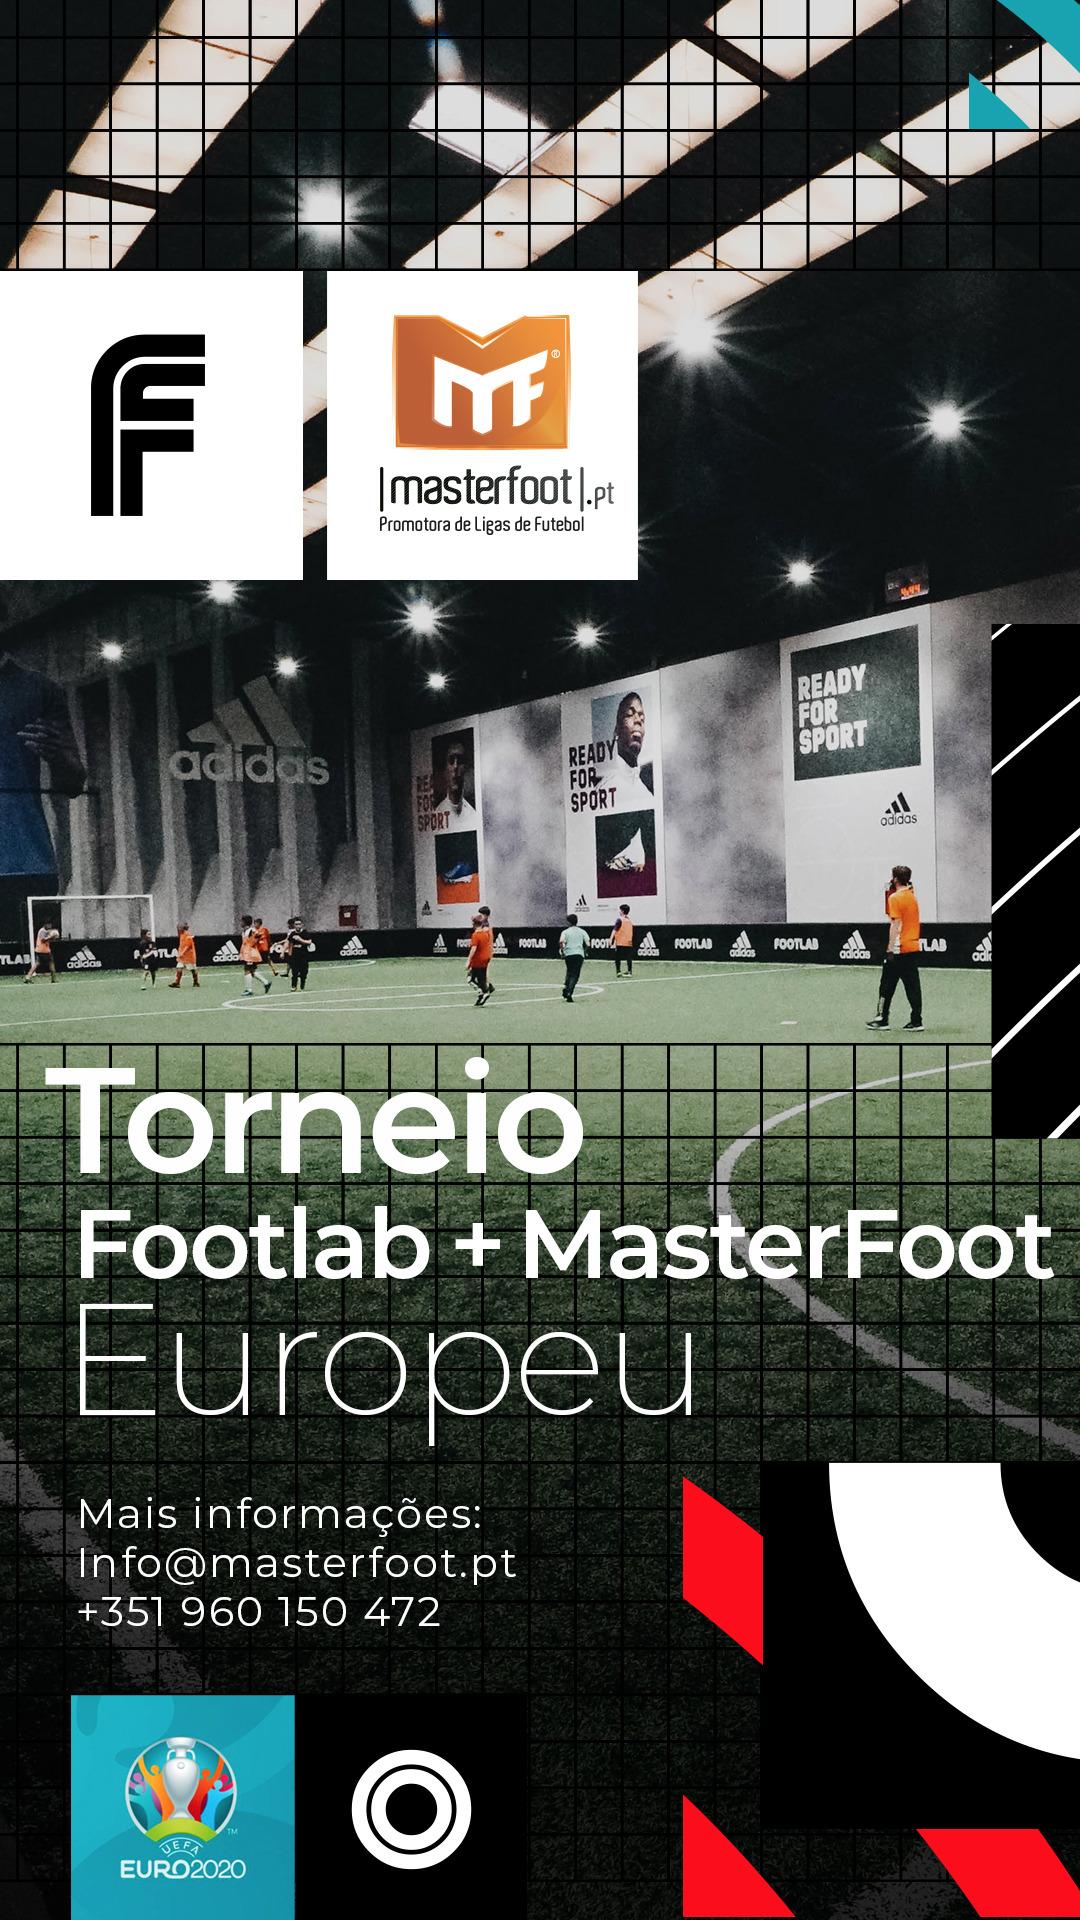 Torneio Europeu Footlab + MasterFoot